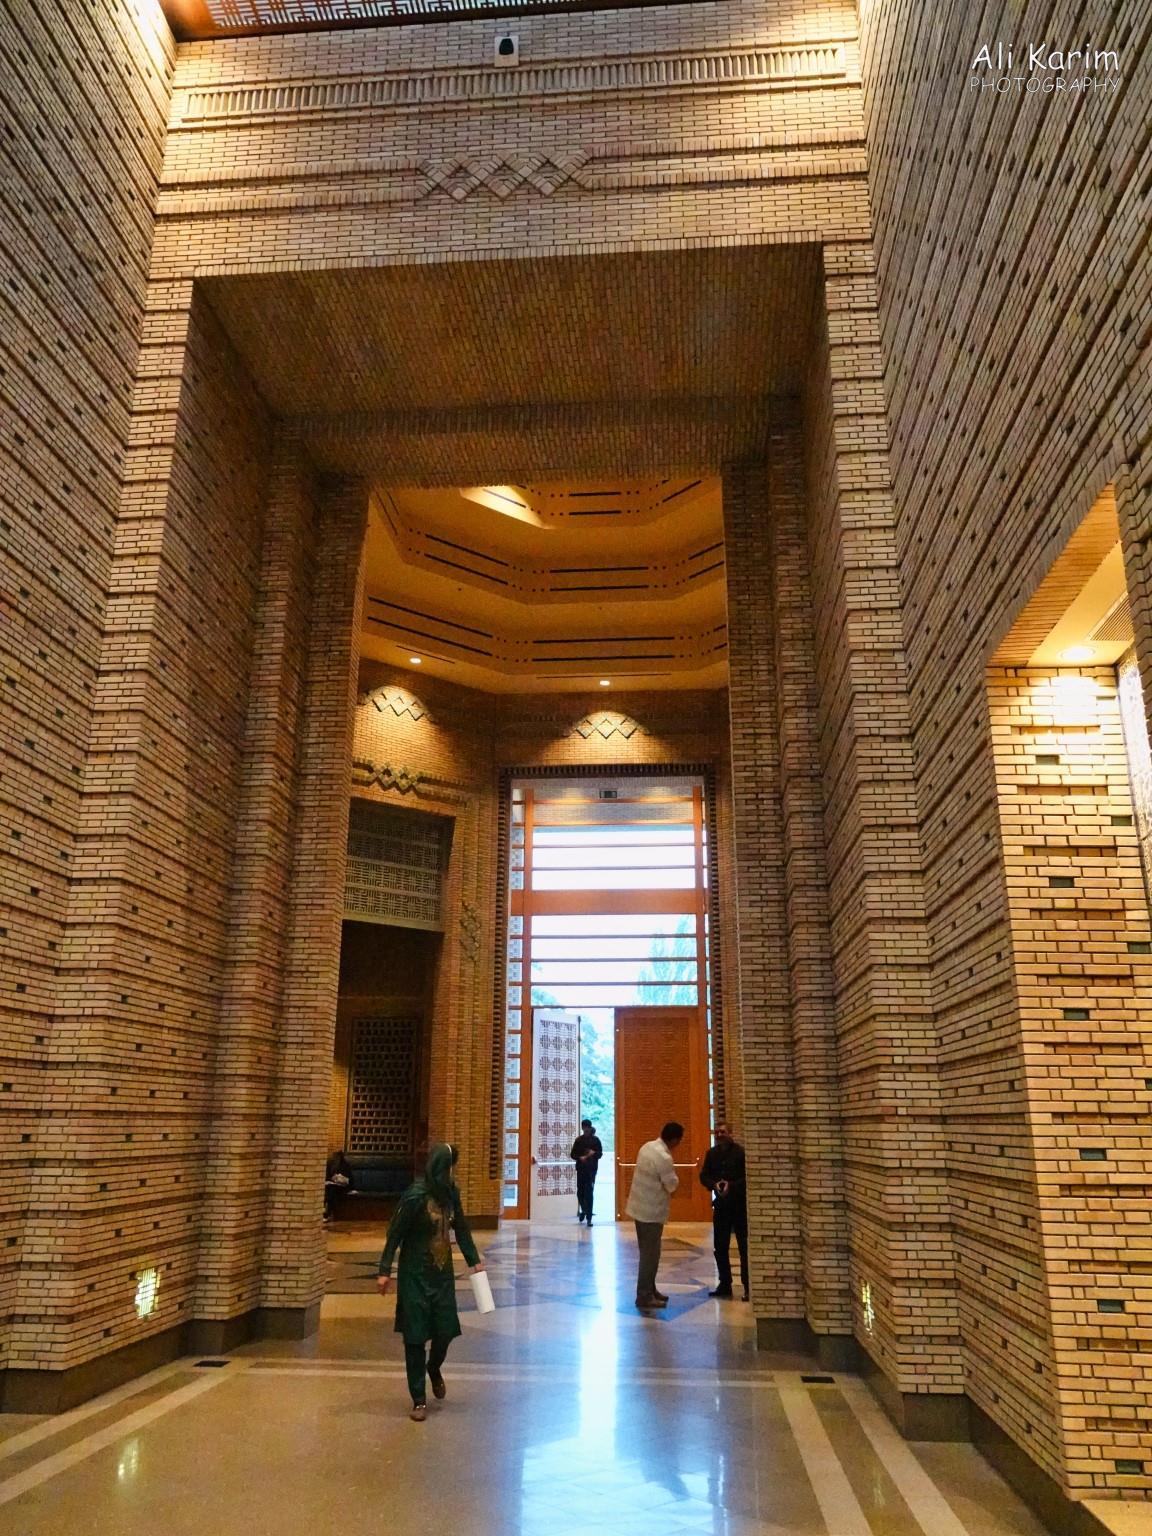 Dushanbe, Tajikistan Inside the imposing entryway; the bricks & design of insets were patterned after the Ismoil Somoni mausoleum in Bukhara, Uzbekistan